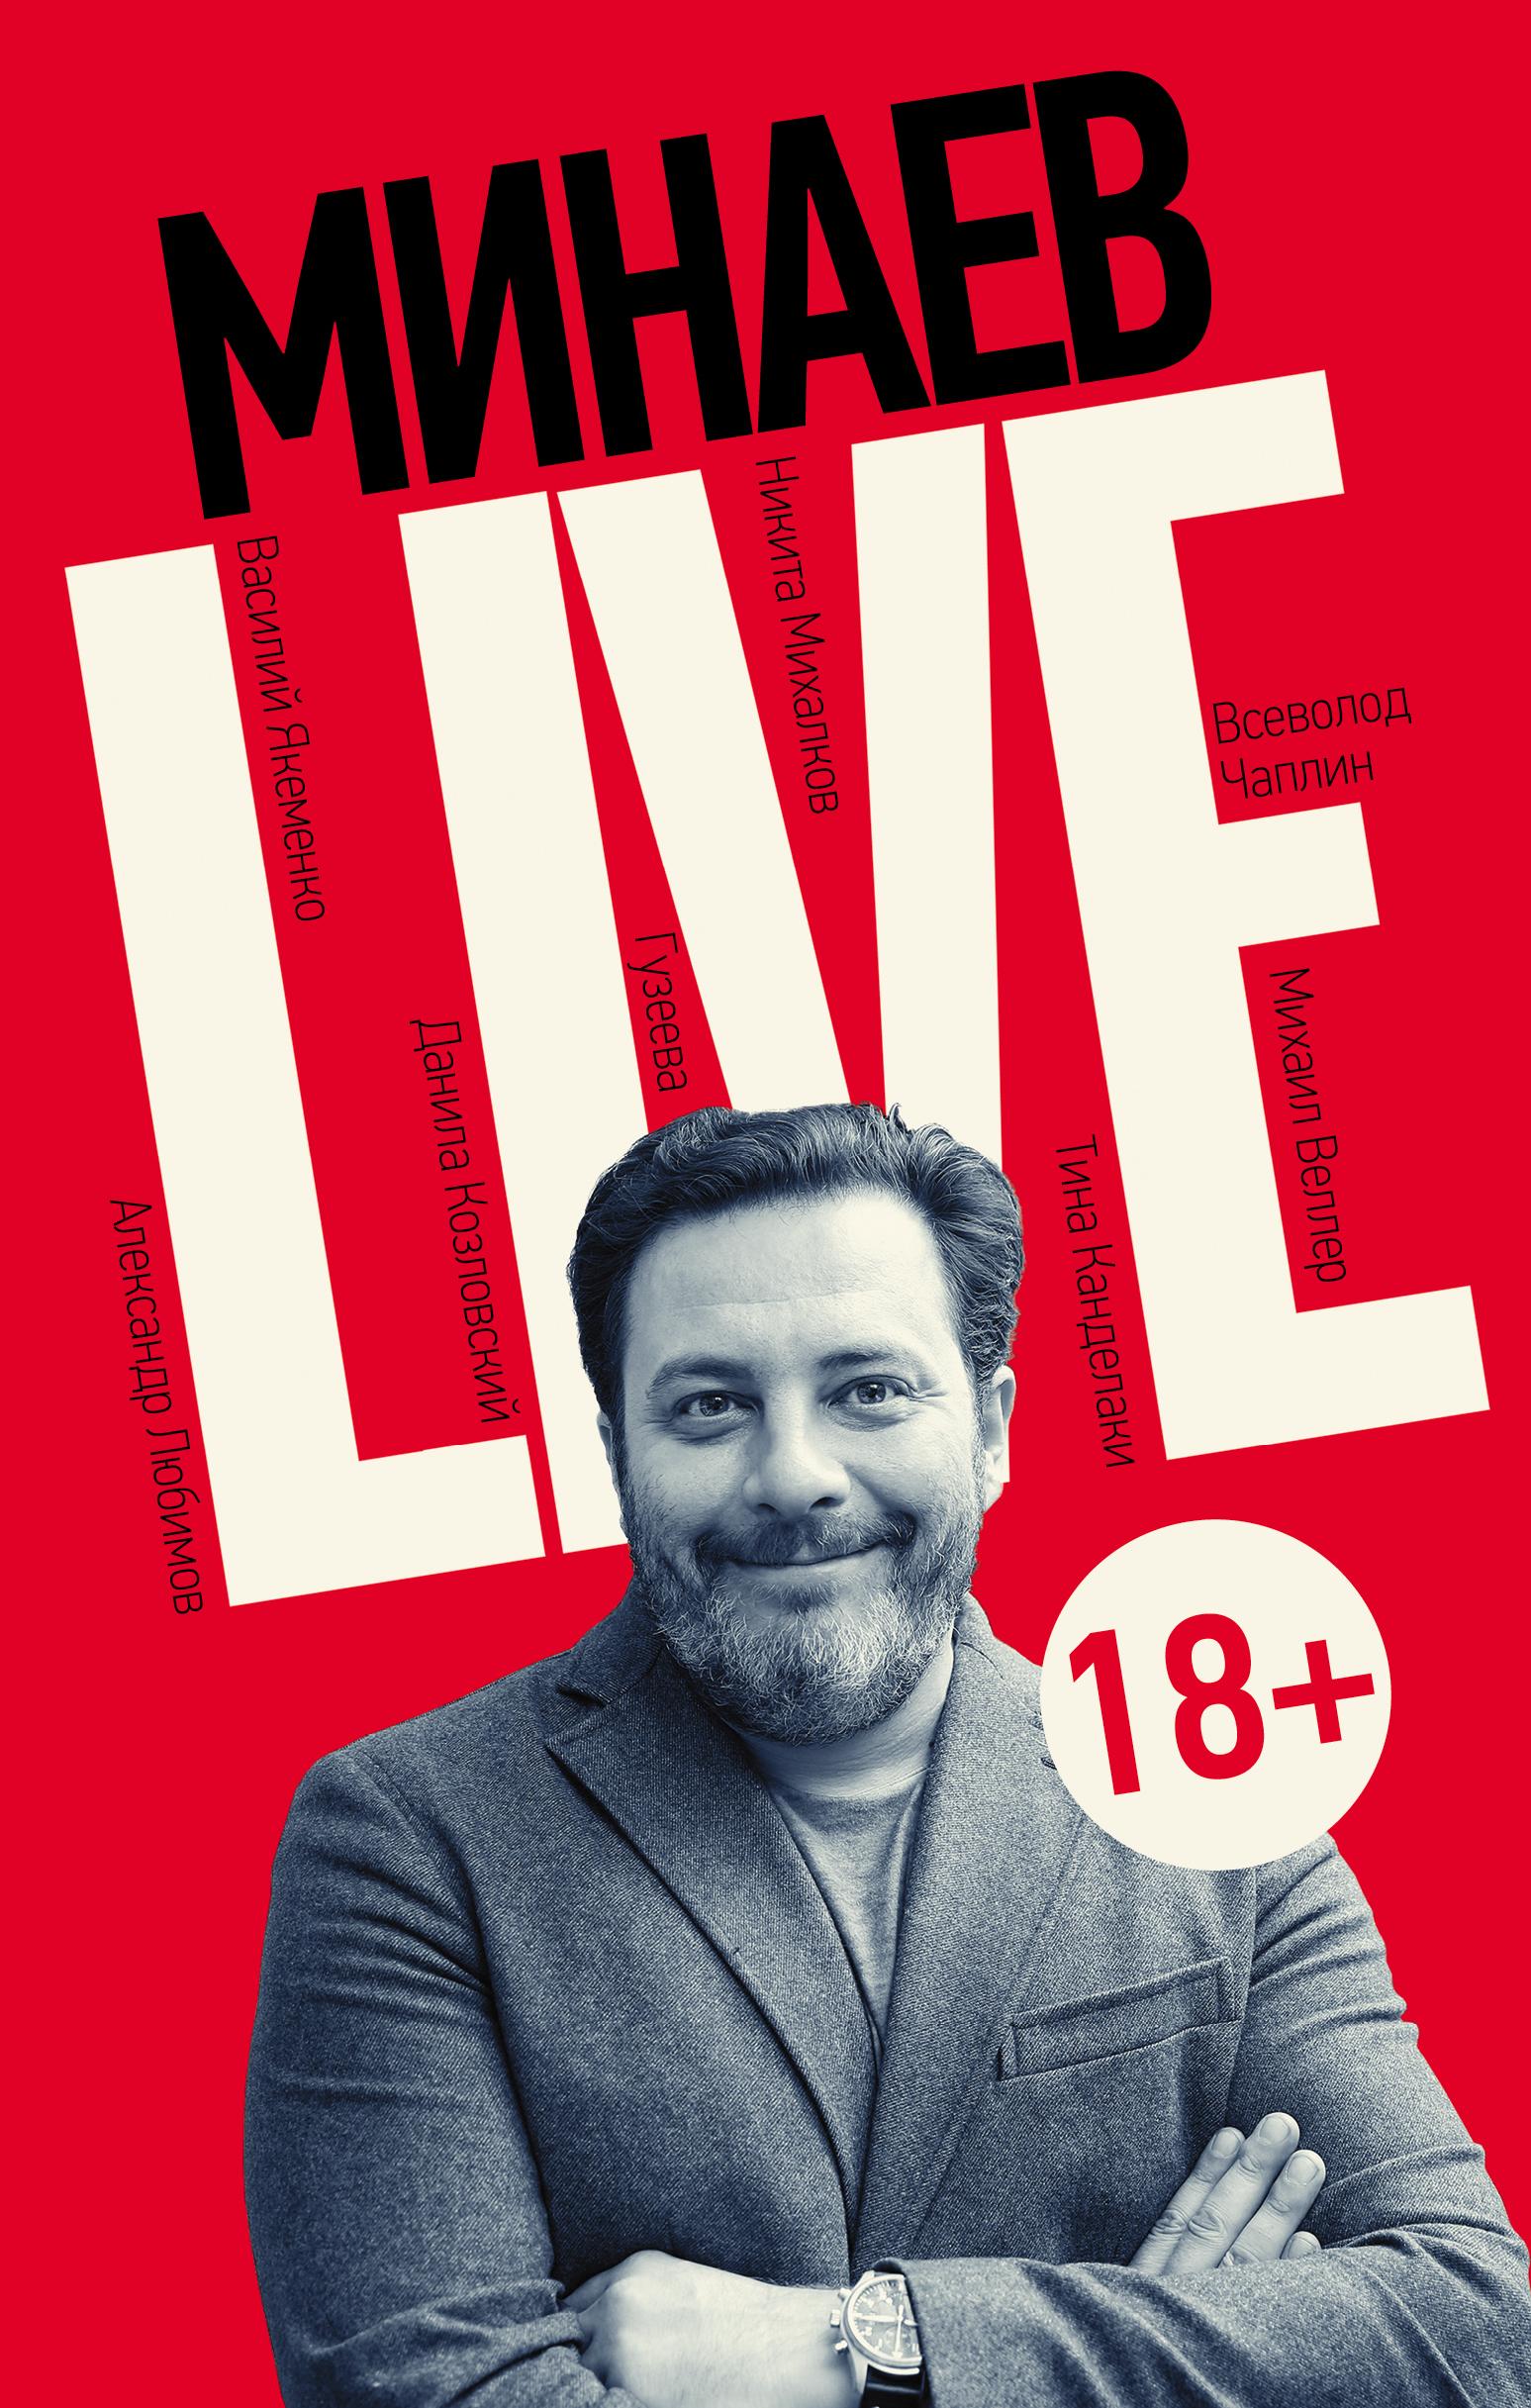 Сергей Минаев Минаев Live минаев с аудиокн минаев духless 21 века селфи